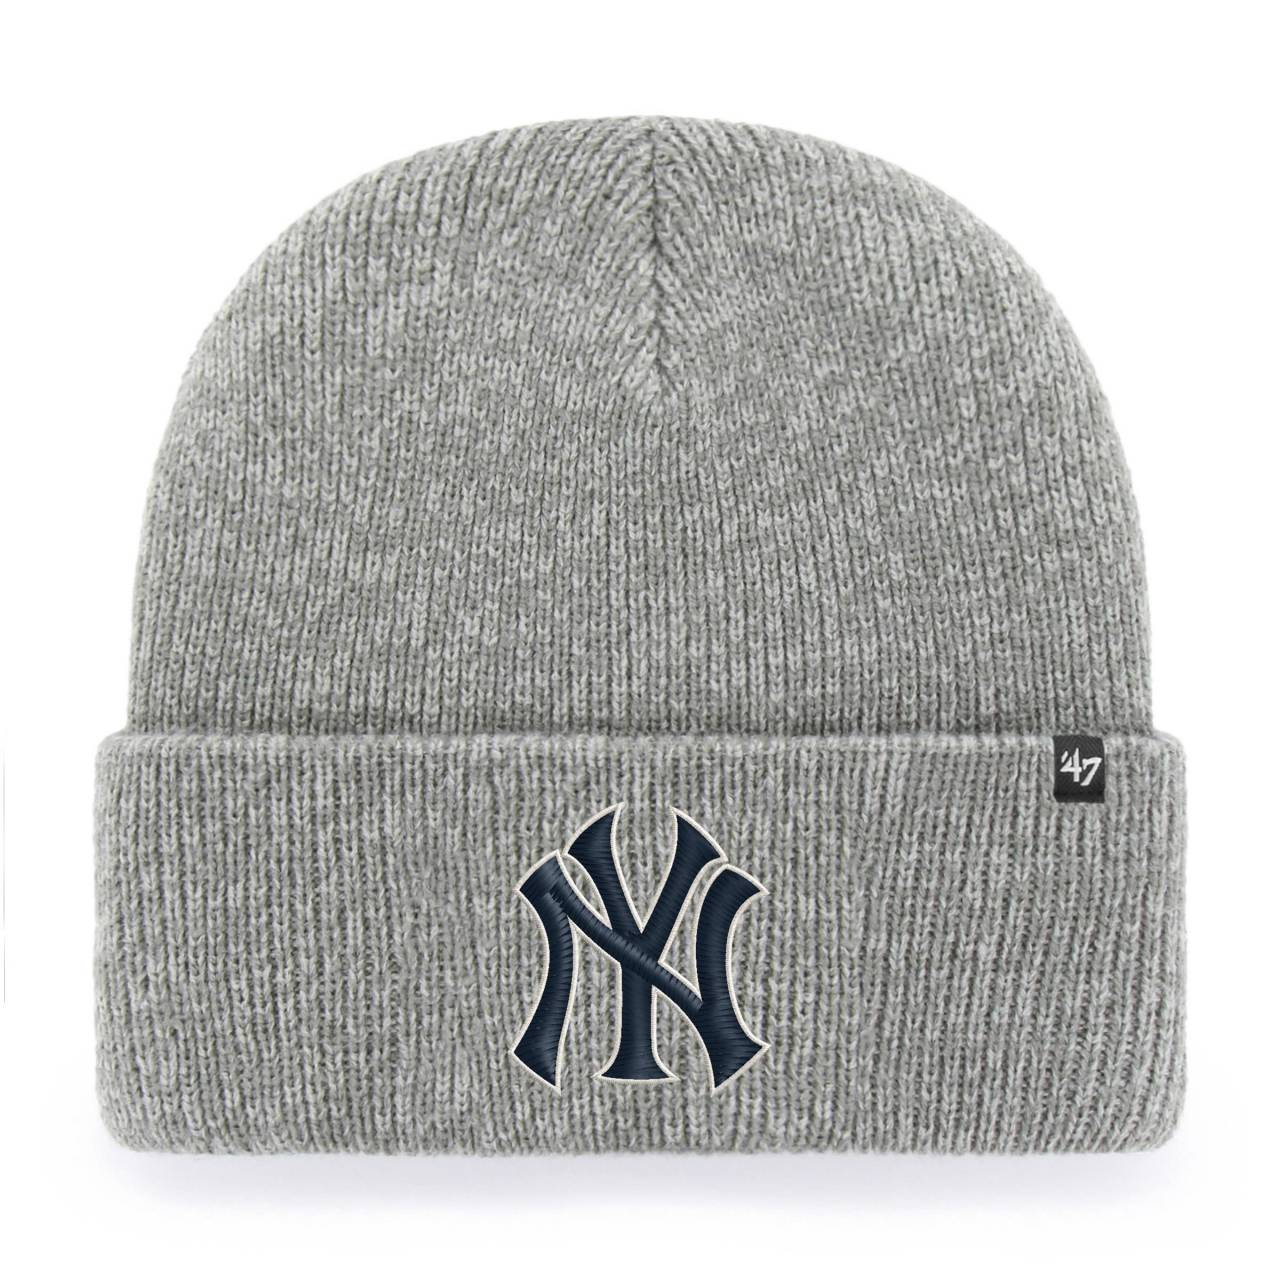 MLB NEW YORK YANKEES BRAIN FREEZE ´47 CUFF KNIT GREY